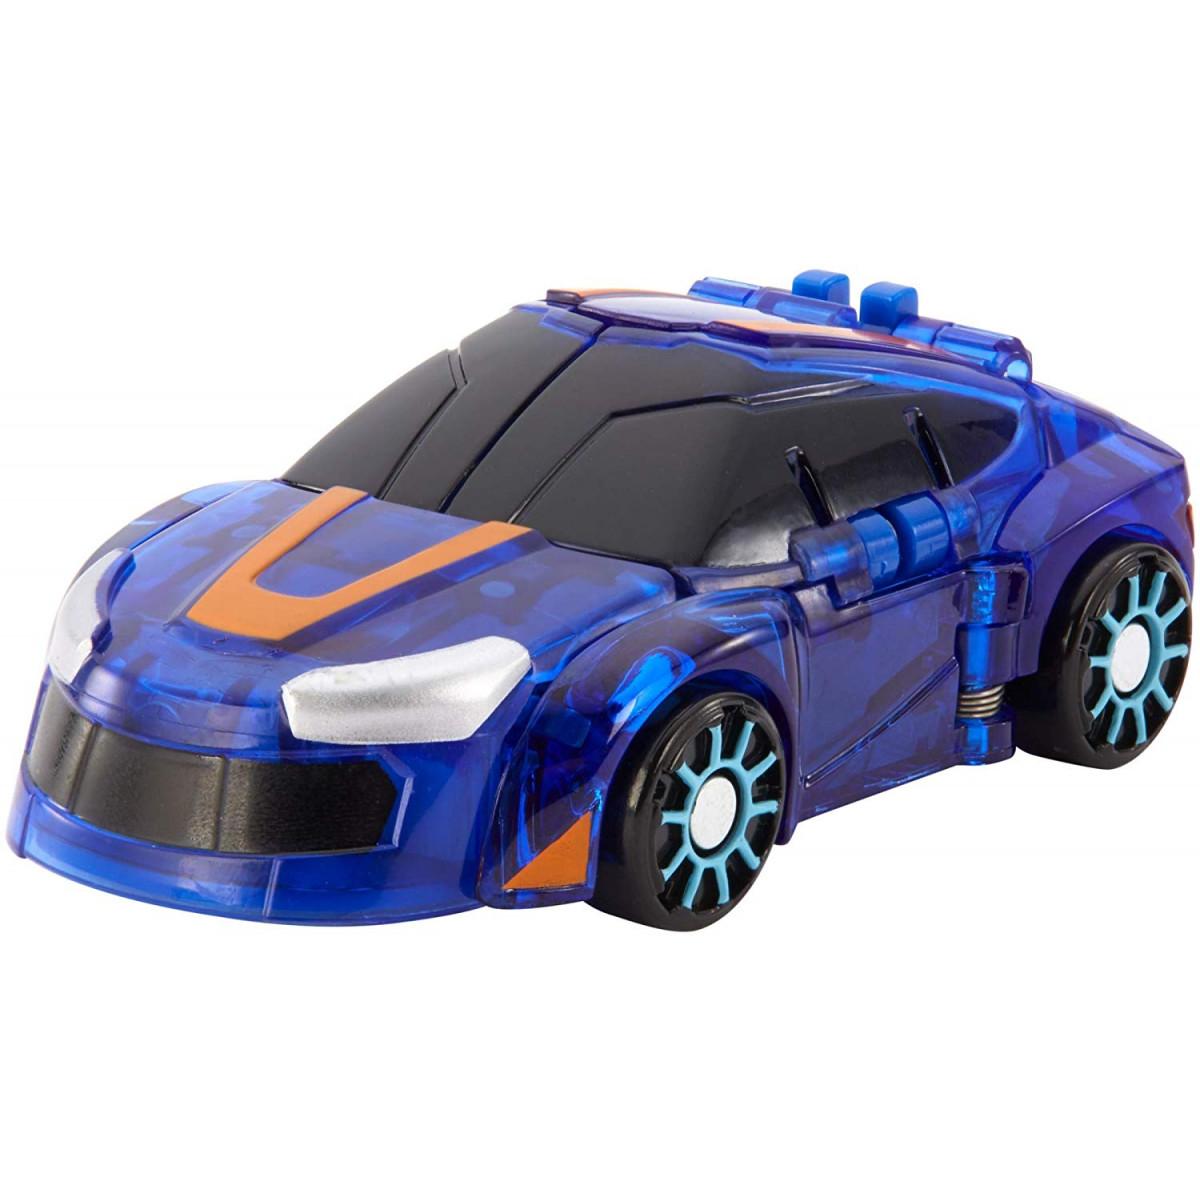 Mecard Evan Deluxe Transforming Robot to Toy Car